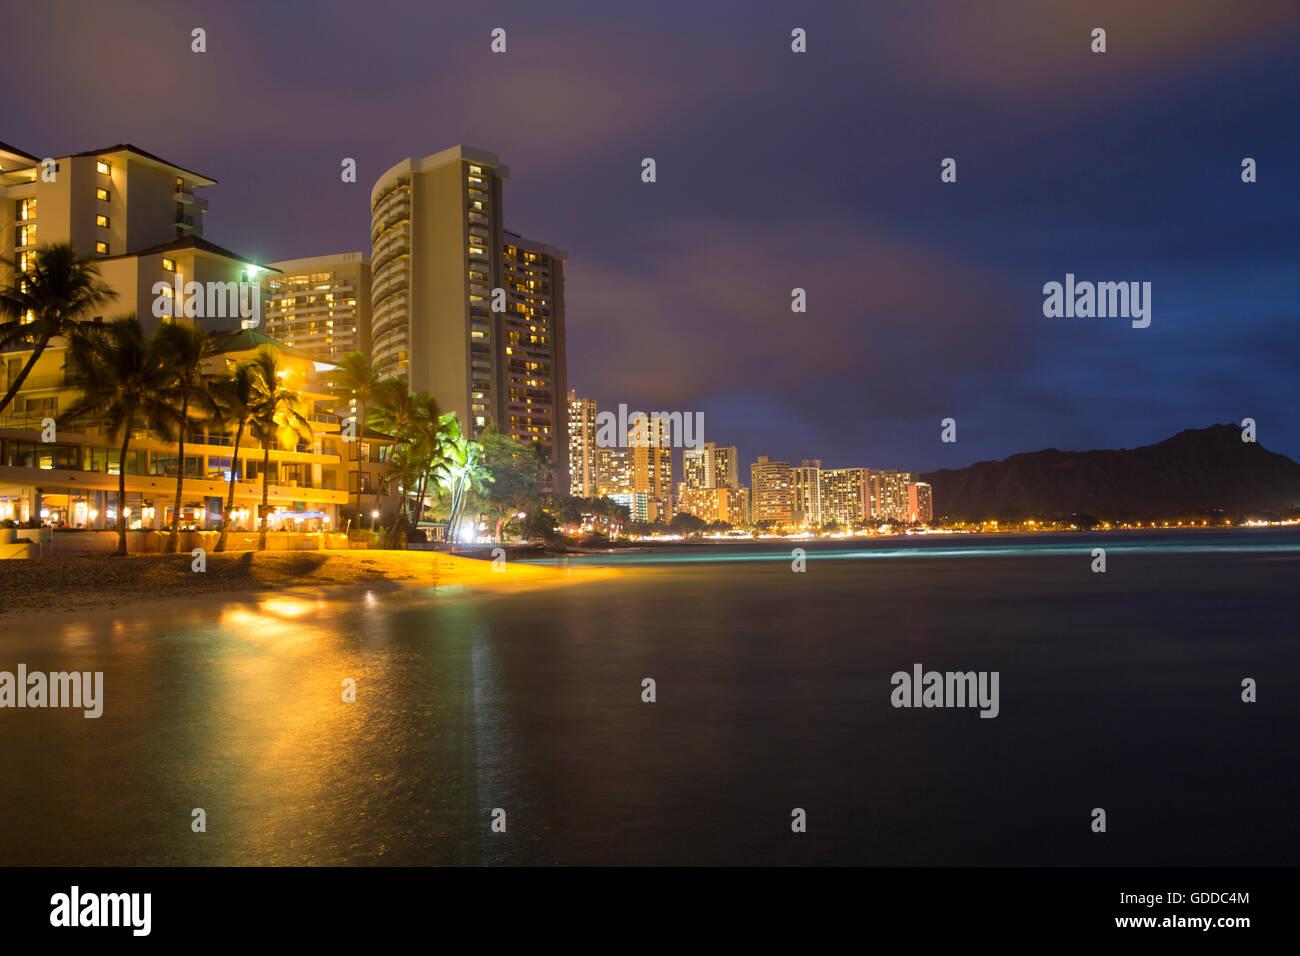 Honolulu,Oahu,capital,Waikiki Beach,USA,Hawaii,America,town,city,evening, - Stock Image